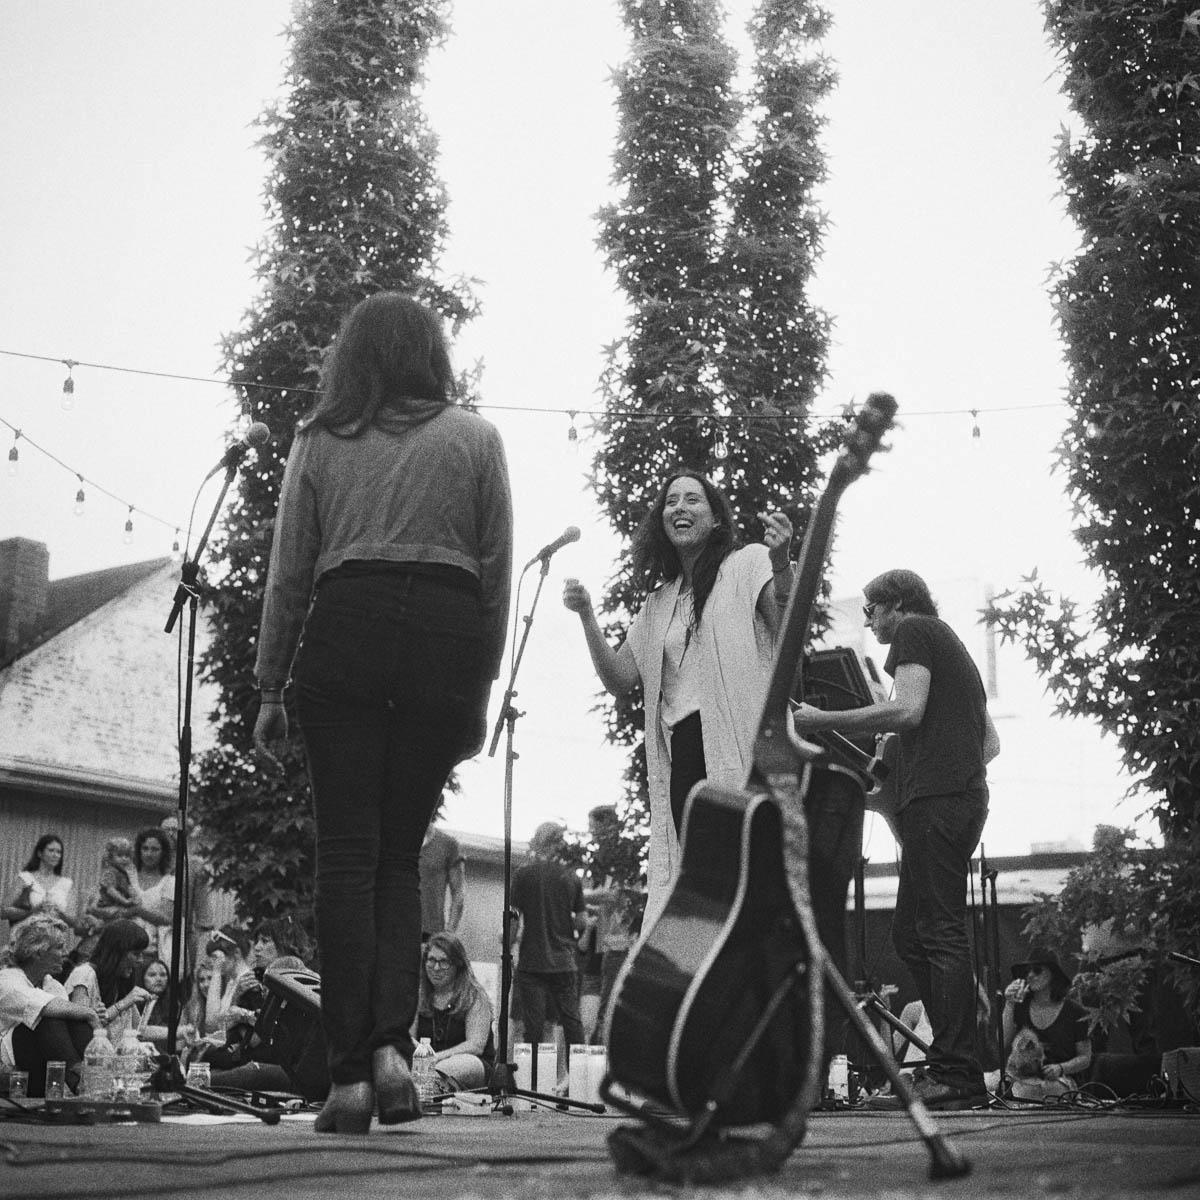 nashville black and white film event photographer documentary ©2015abigailbobophotography0012.jpg